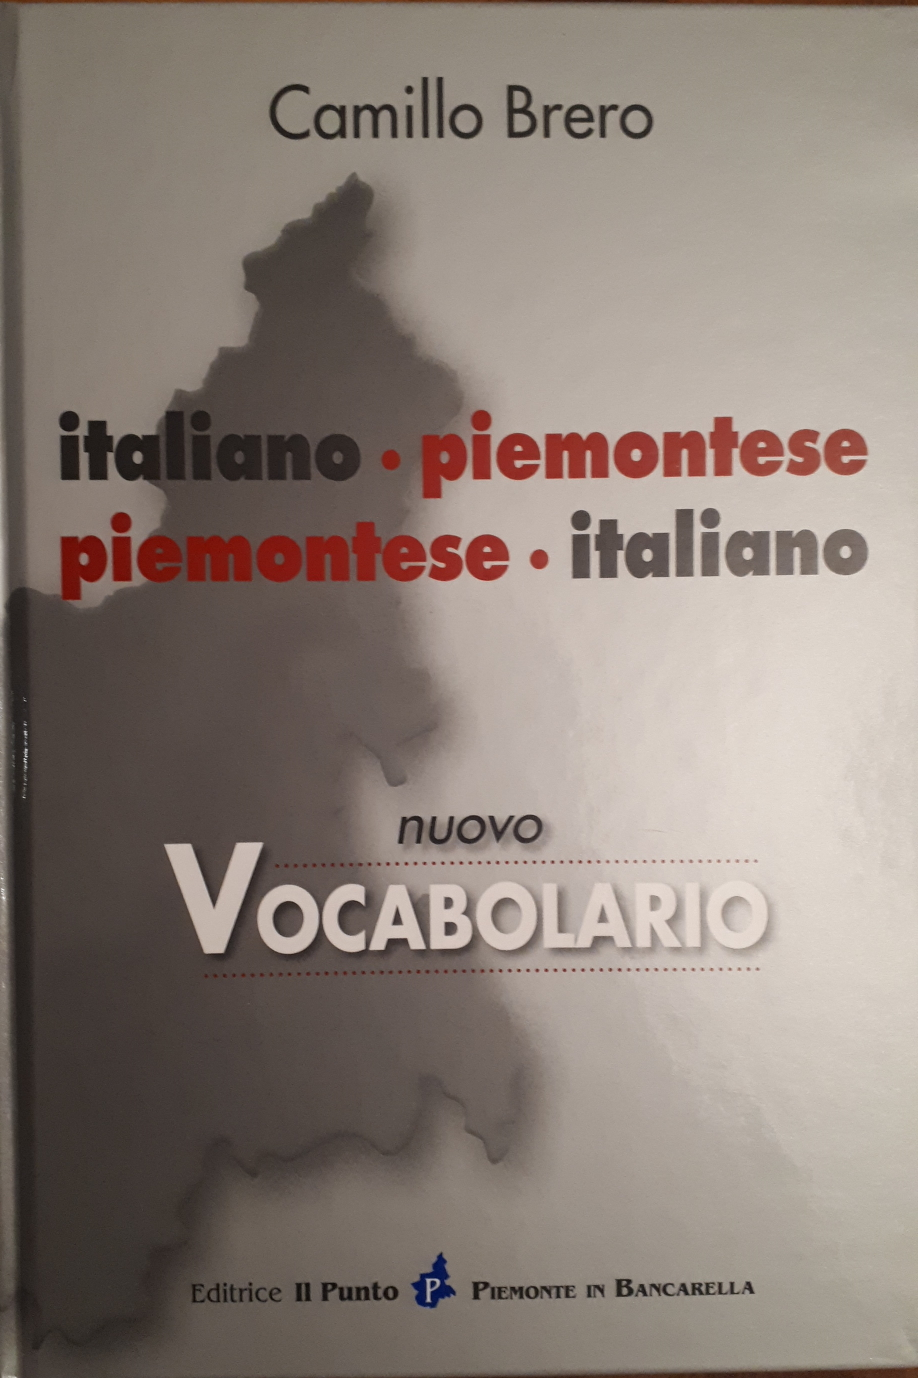 Vocabolario italiano-piemontese, piemontese-italiano